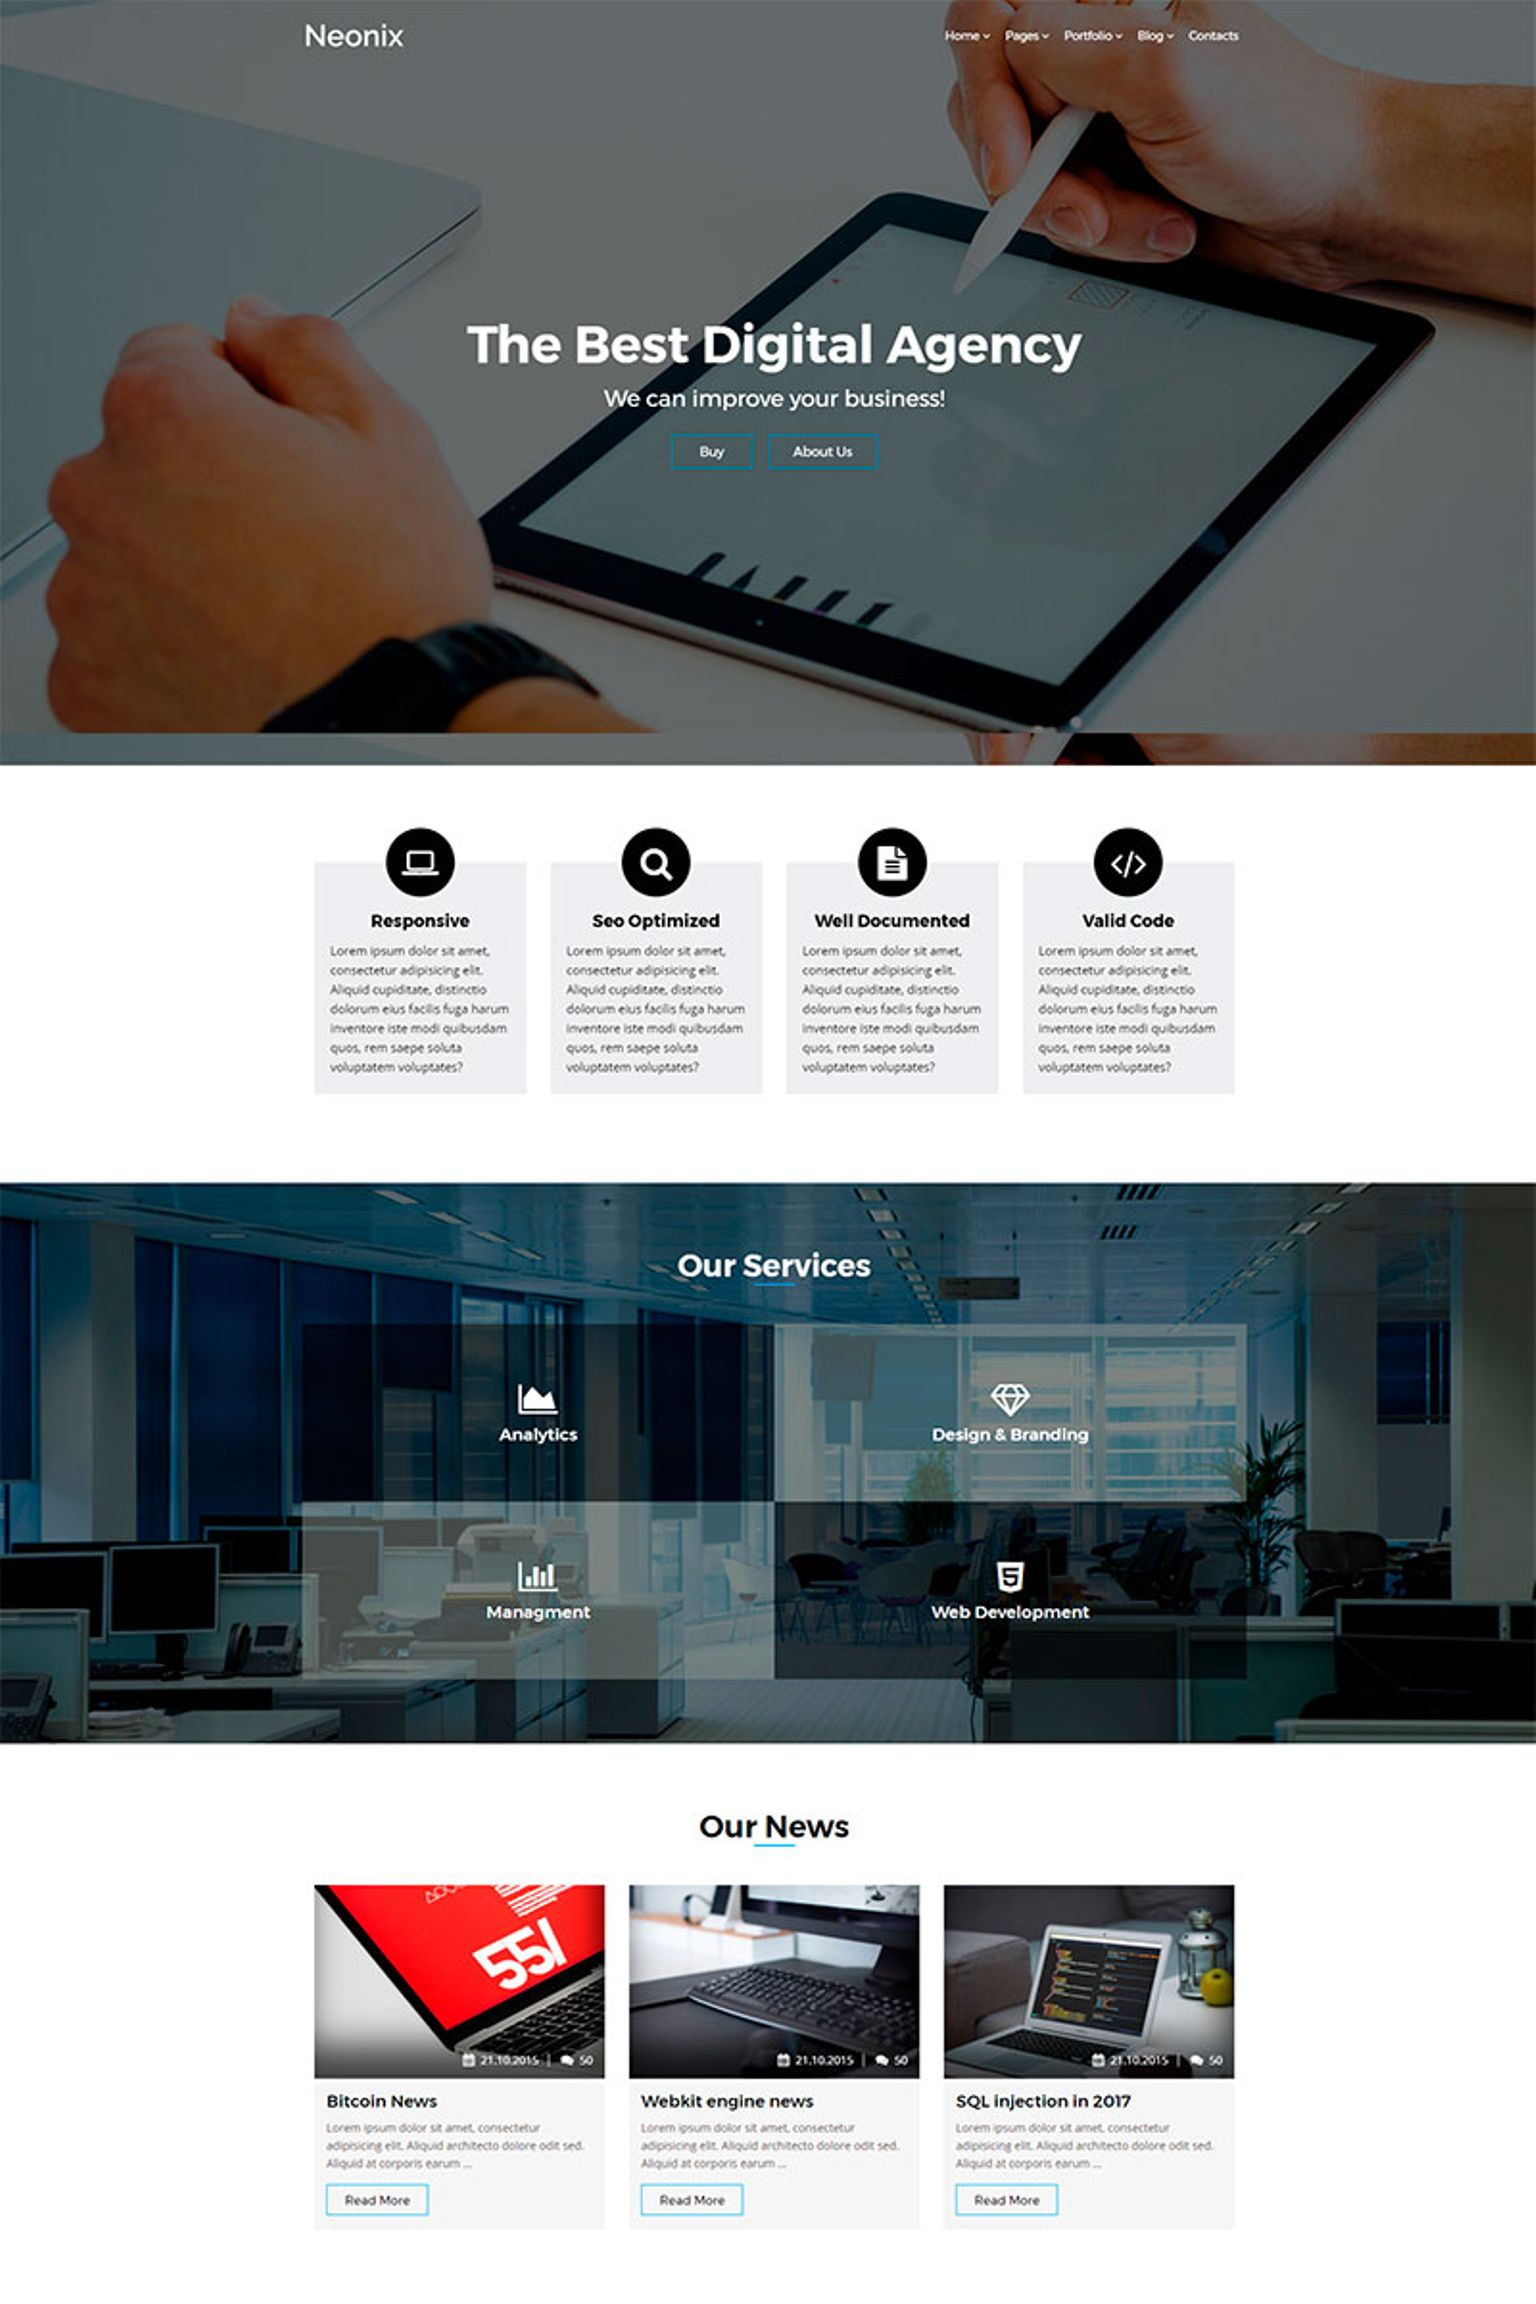 Bootstrap Neonix - Digital Agency Wordpress #65440 - Ekran resmi